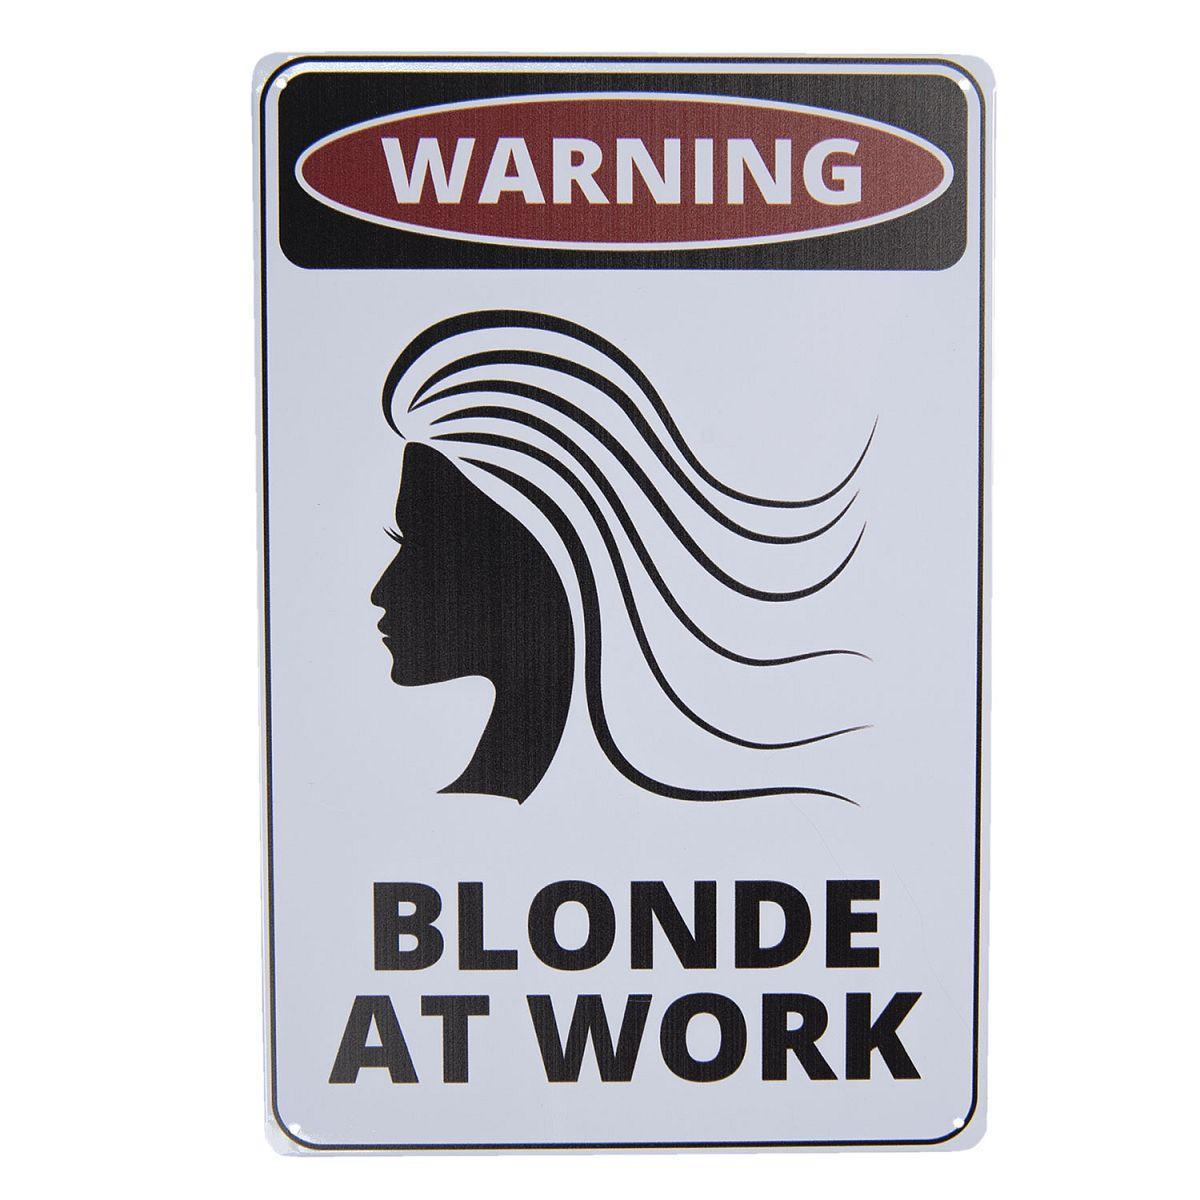 1- Cedule BLOND AT WORK